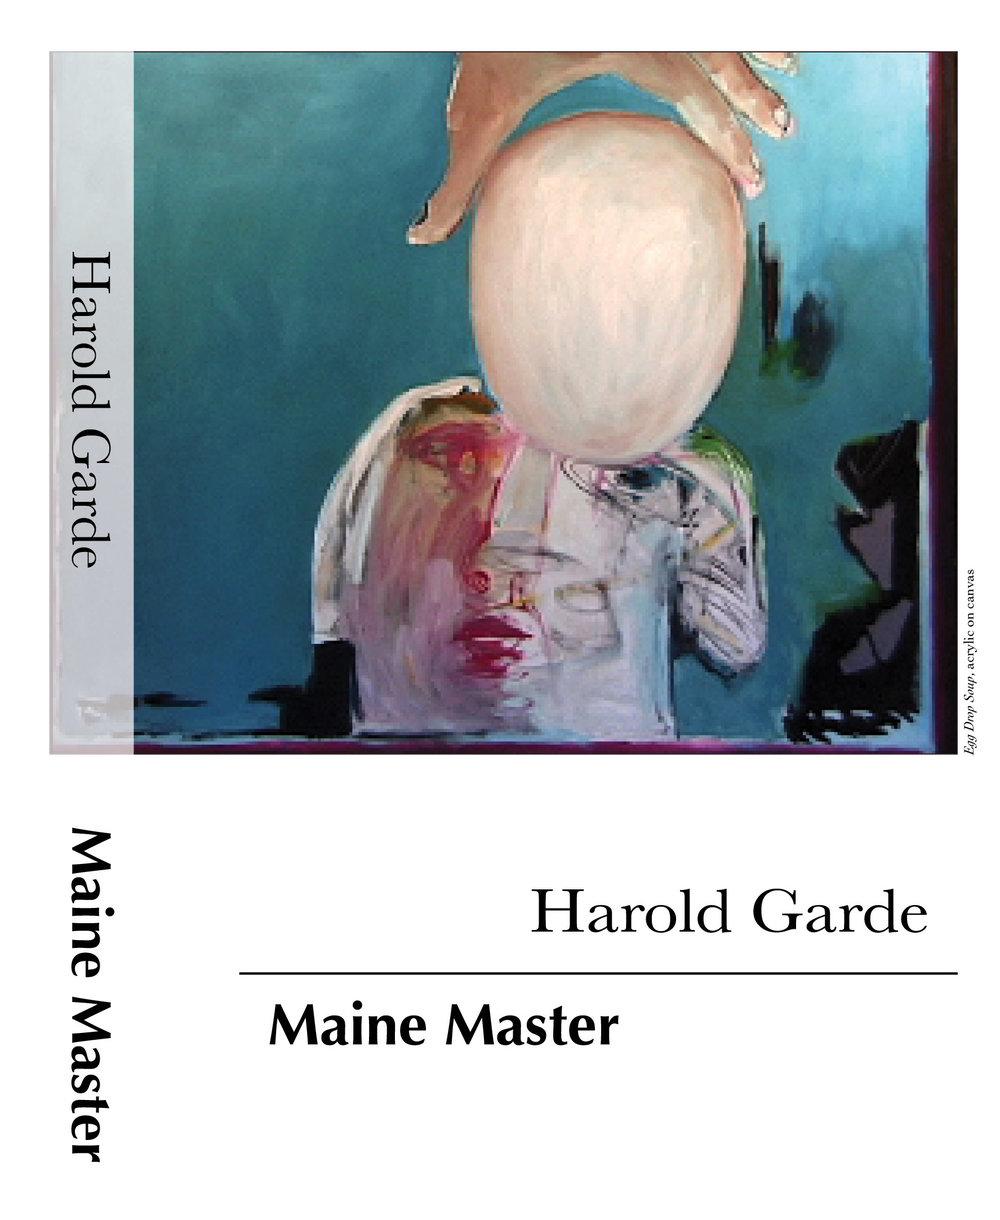 Garde-DVD cover_cropped.jpg